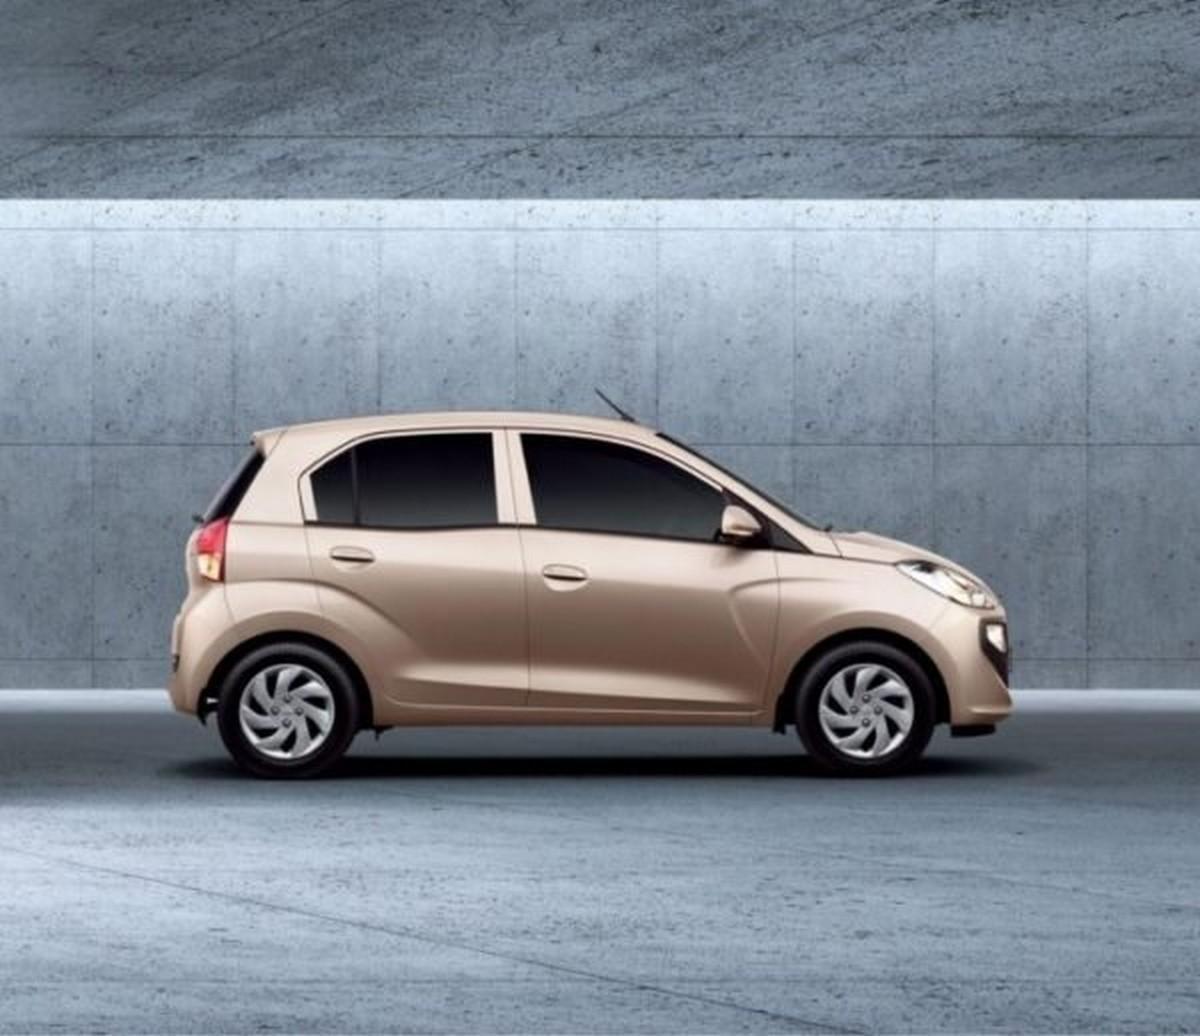 Hyundai Santro golden side look